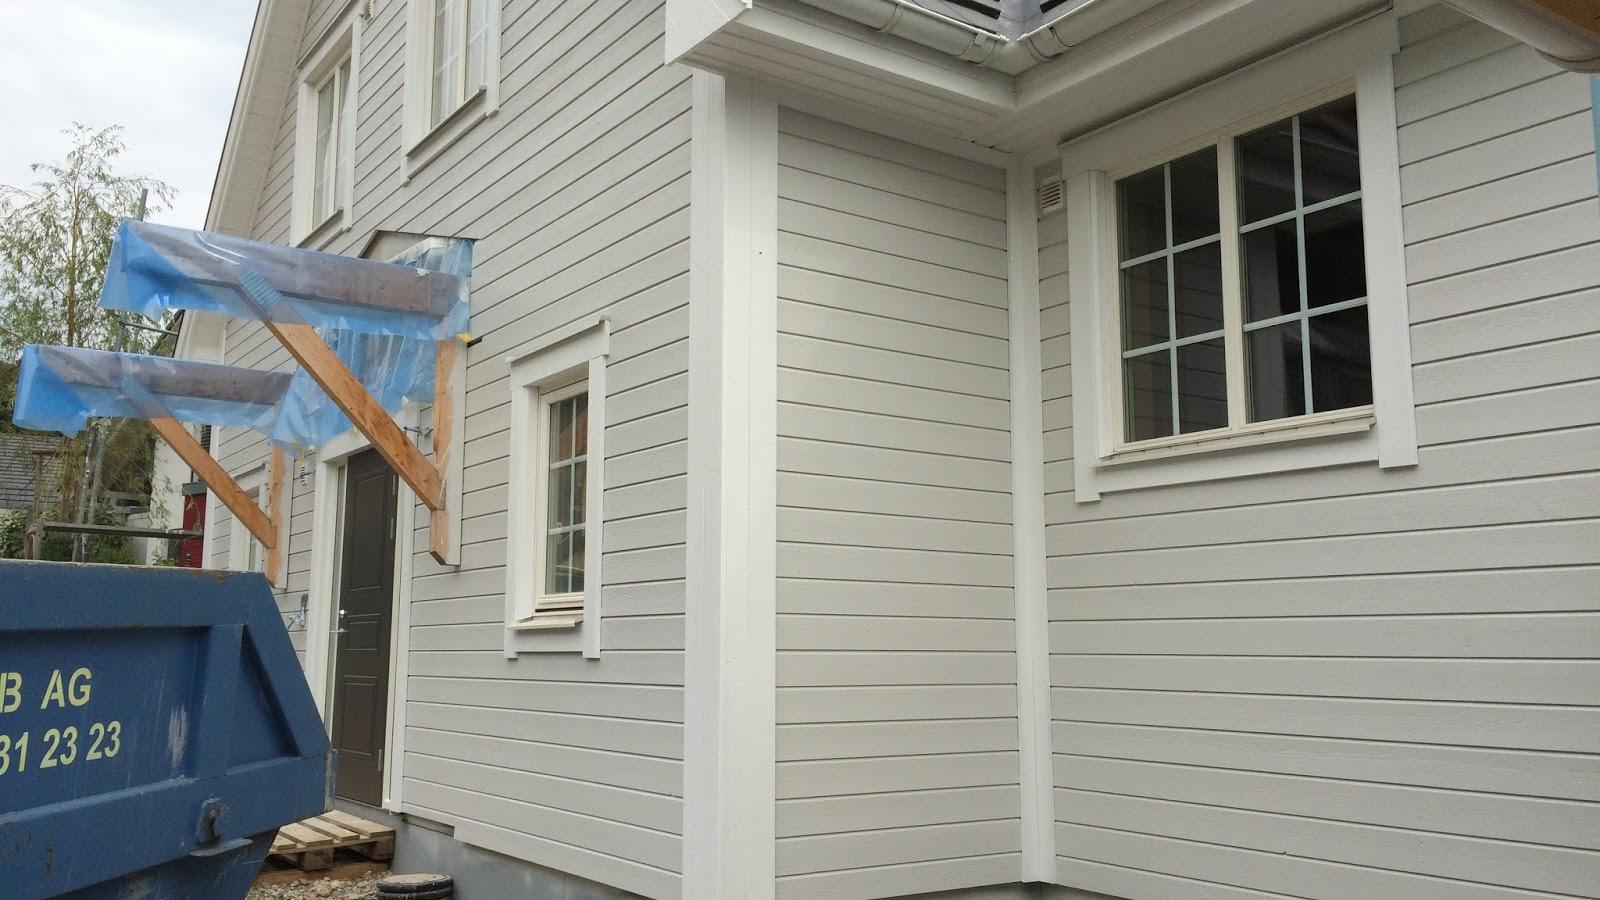 Fassadenfarbe hellgrau  Shades of Grey - unsere Fassadenfarbe! - Beachhouse Living